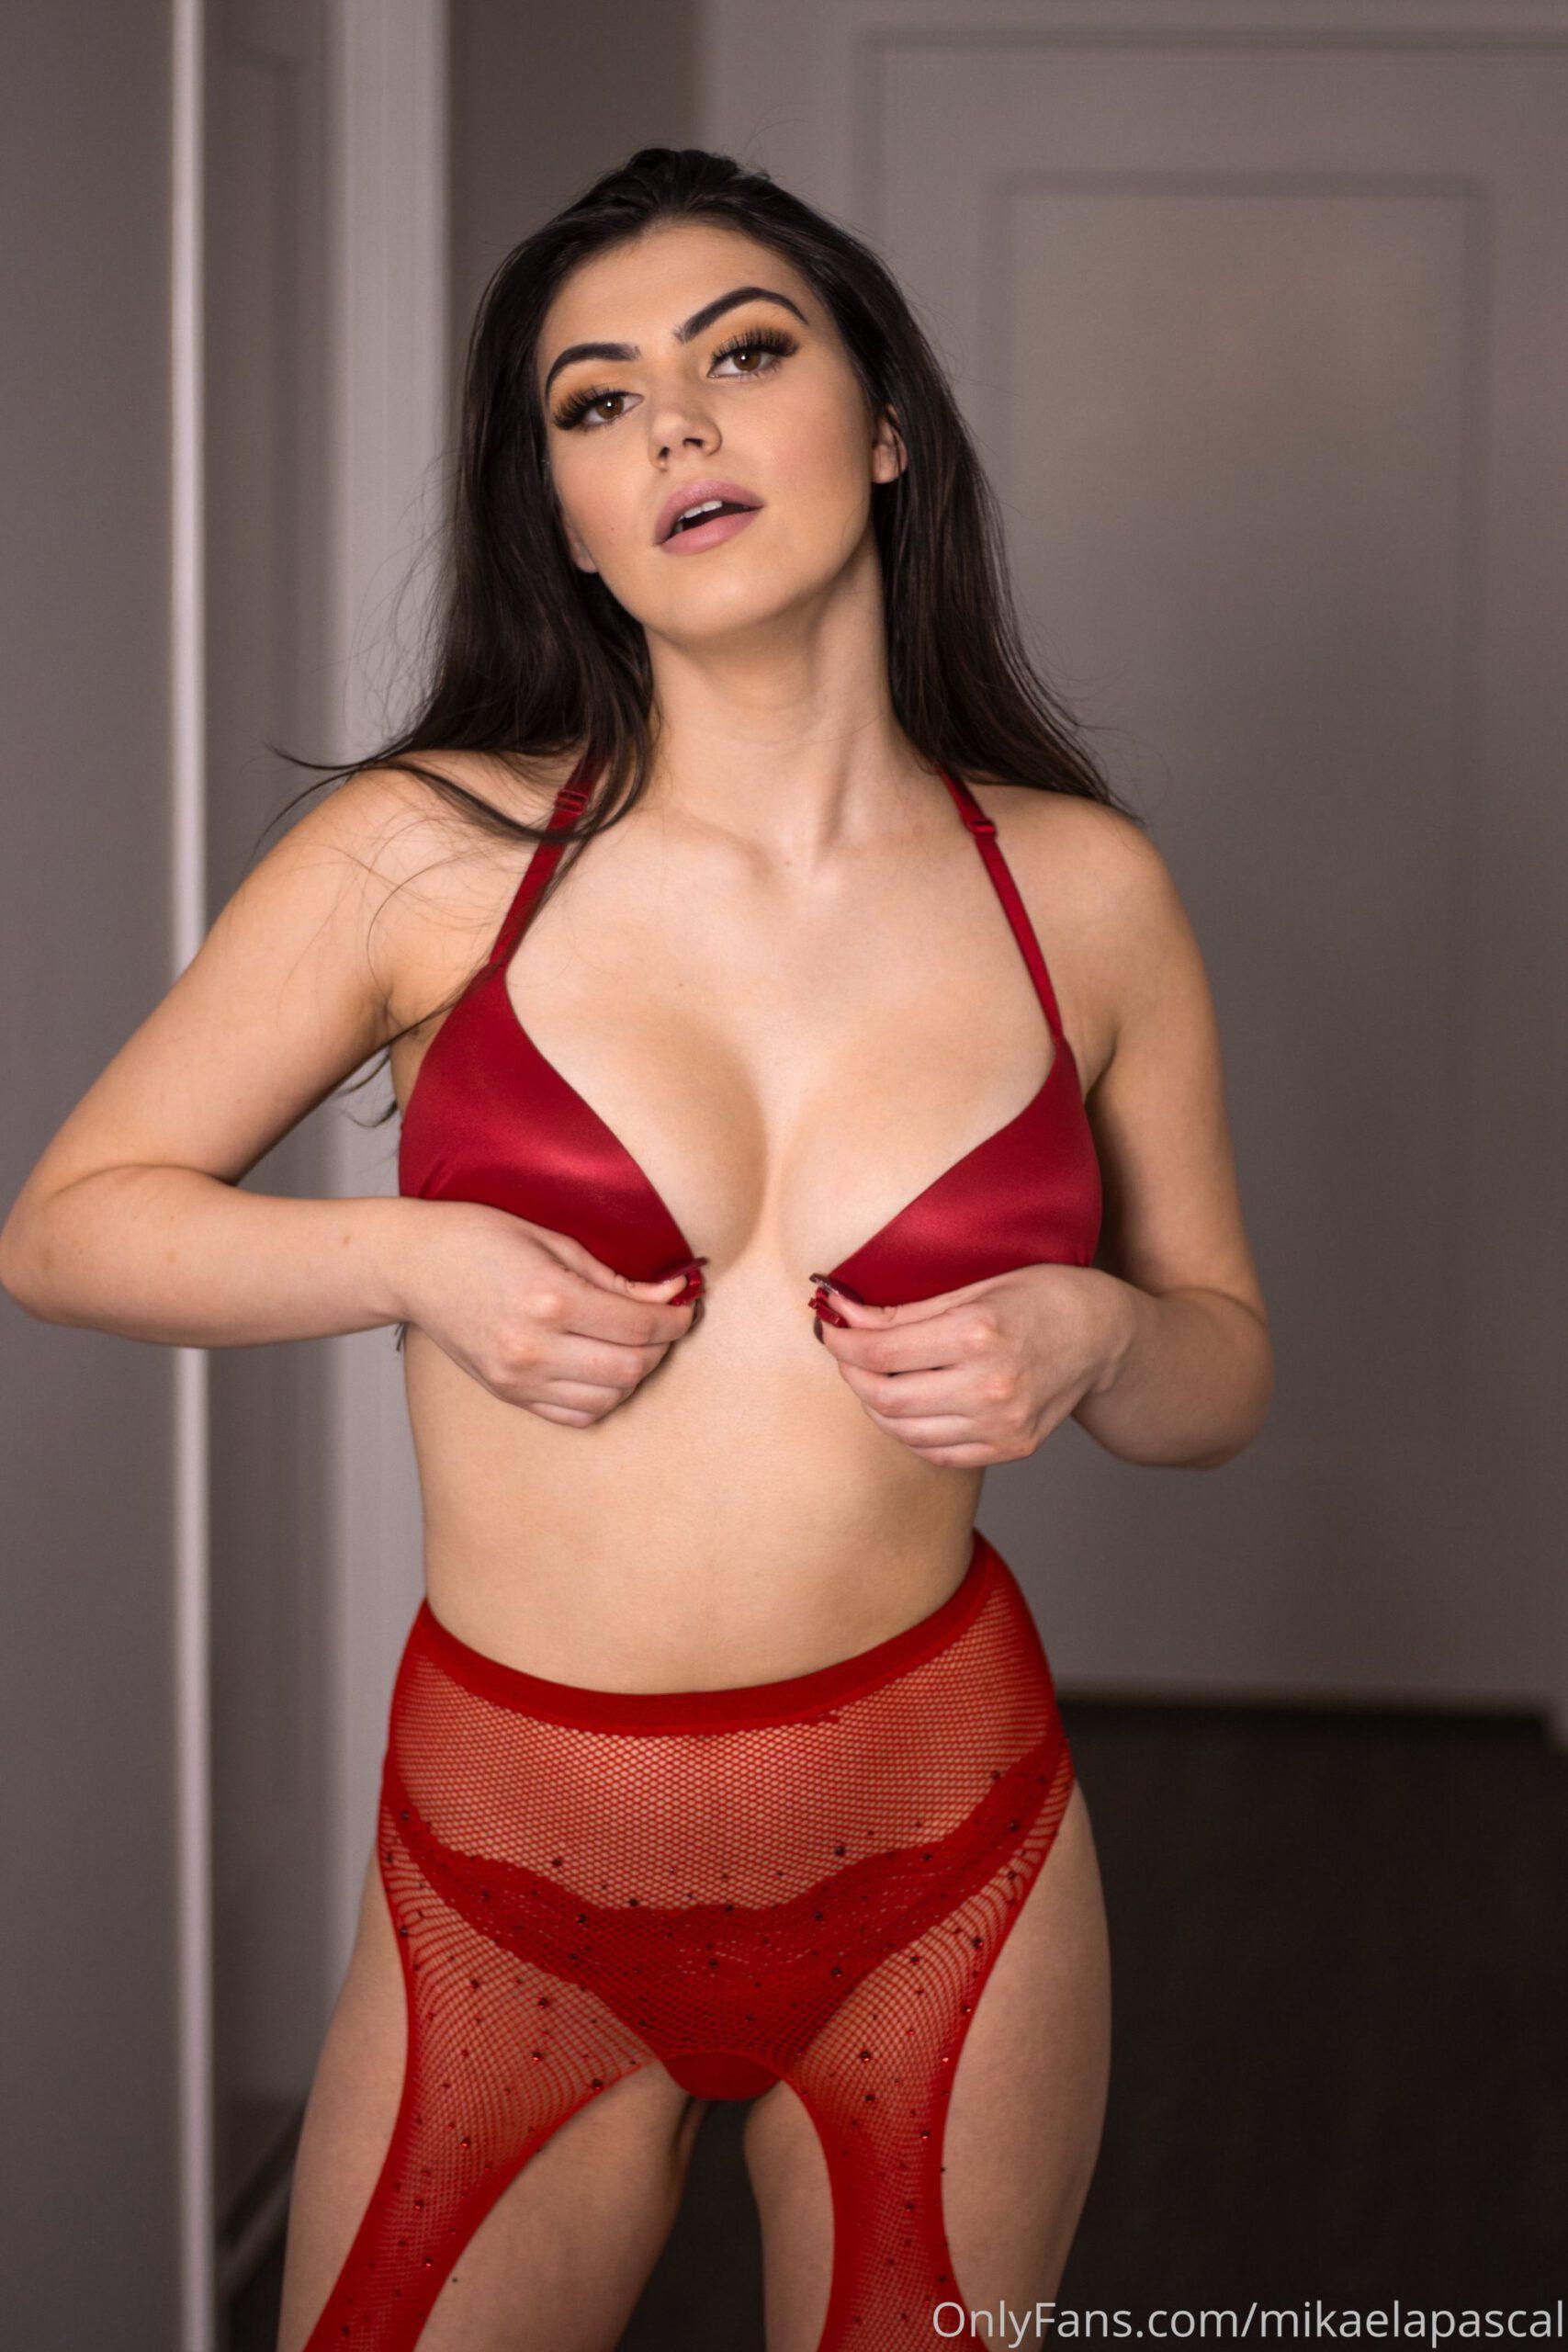 Mikaela Pascal Red Lingerie 0005